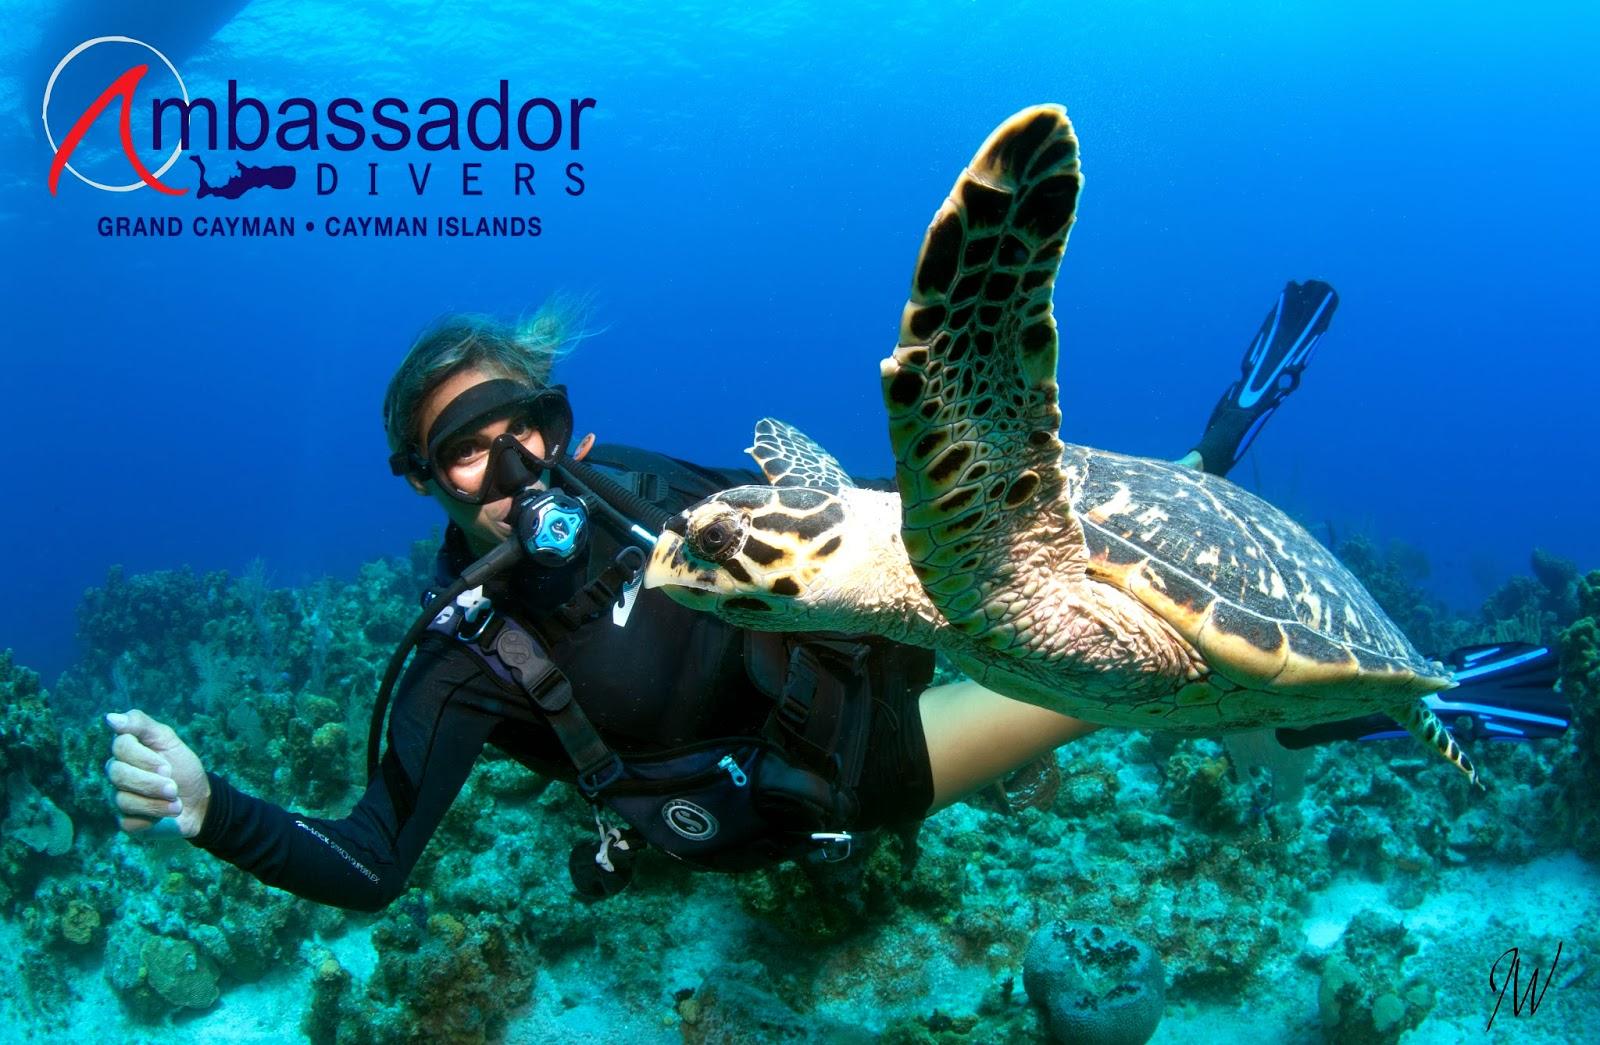 News From Ambassador Divers: Grand Cayman SCUBA Diving